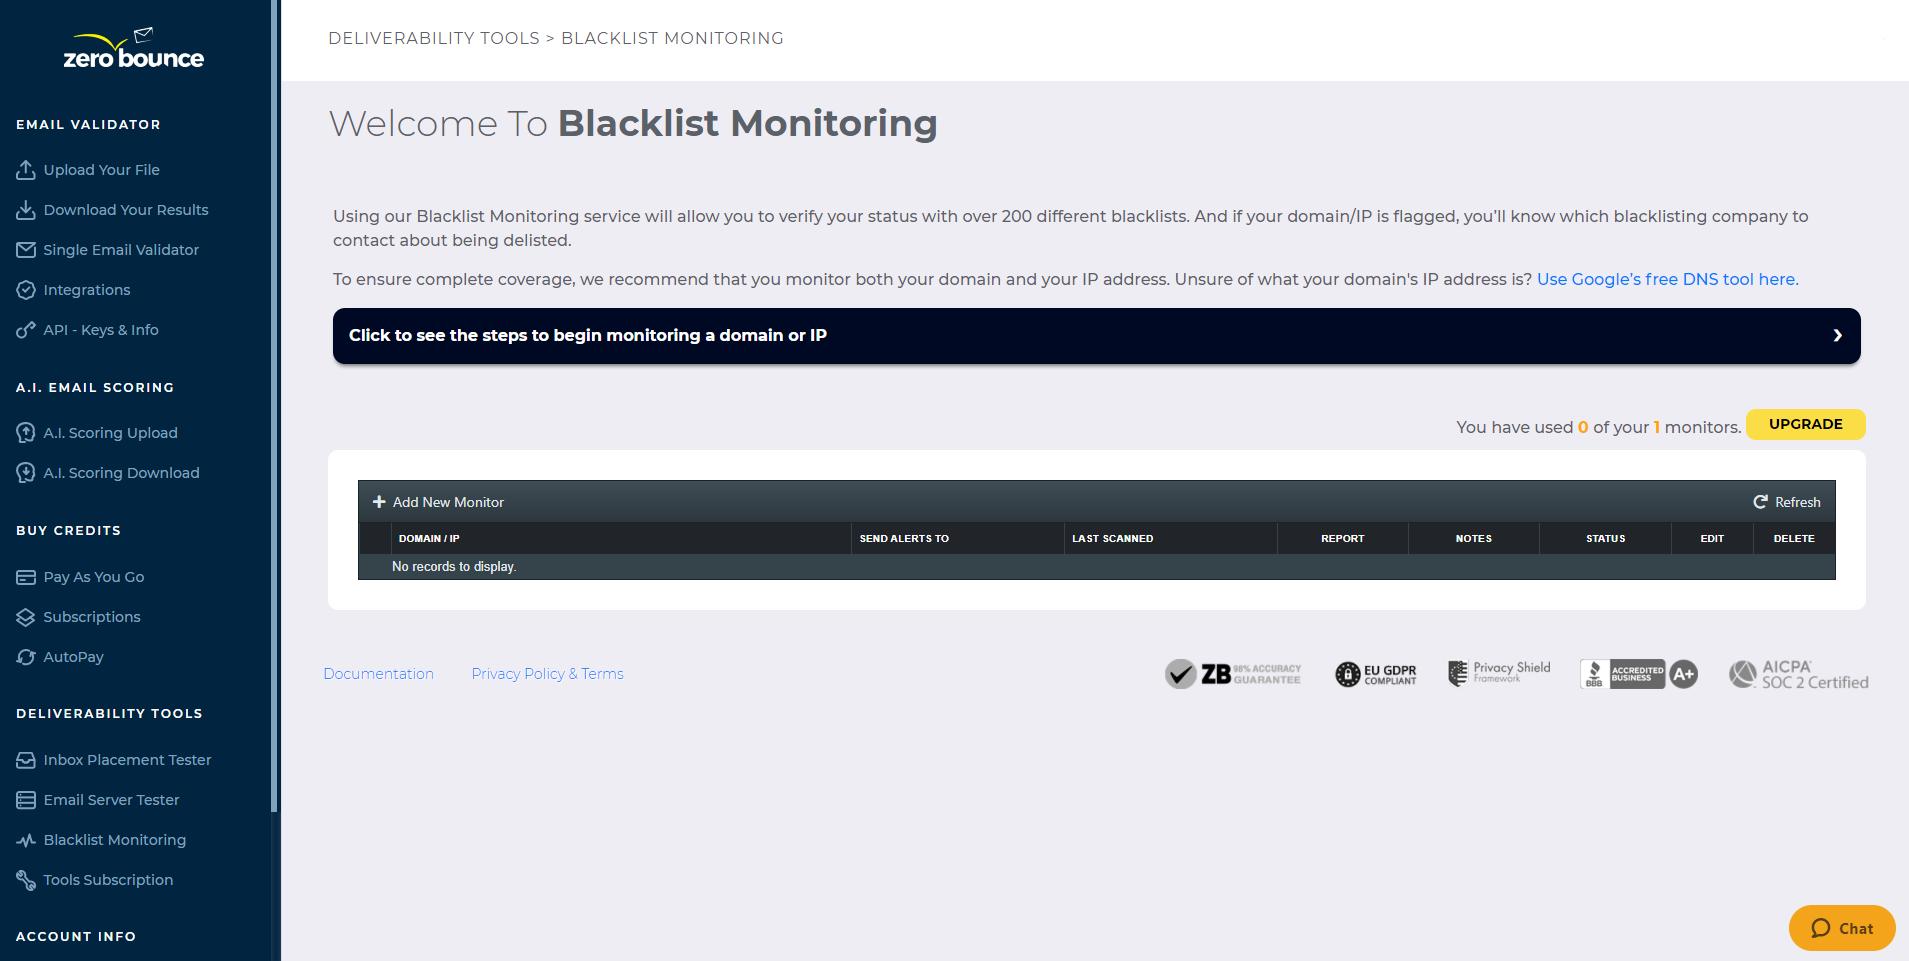 ZeroBounce Blacklist Monitoring Tool